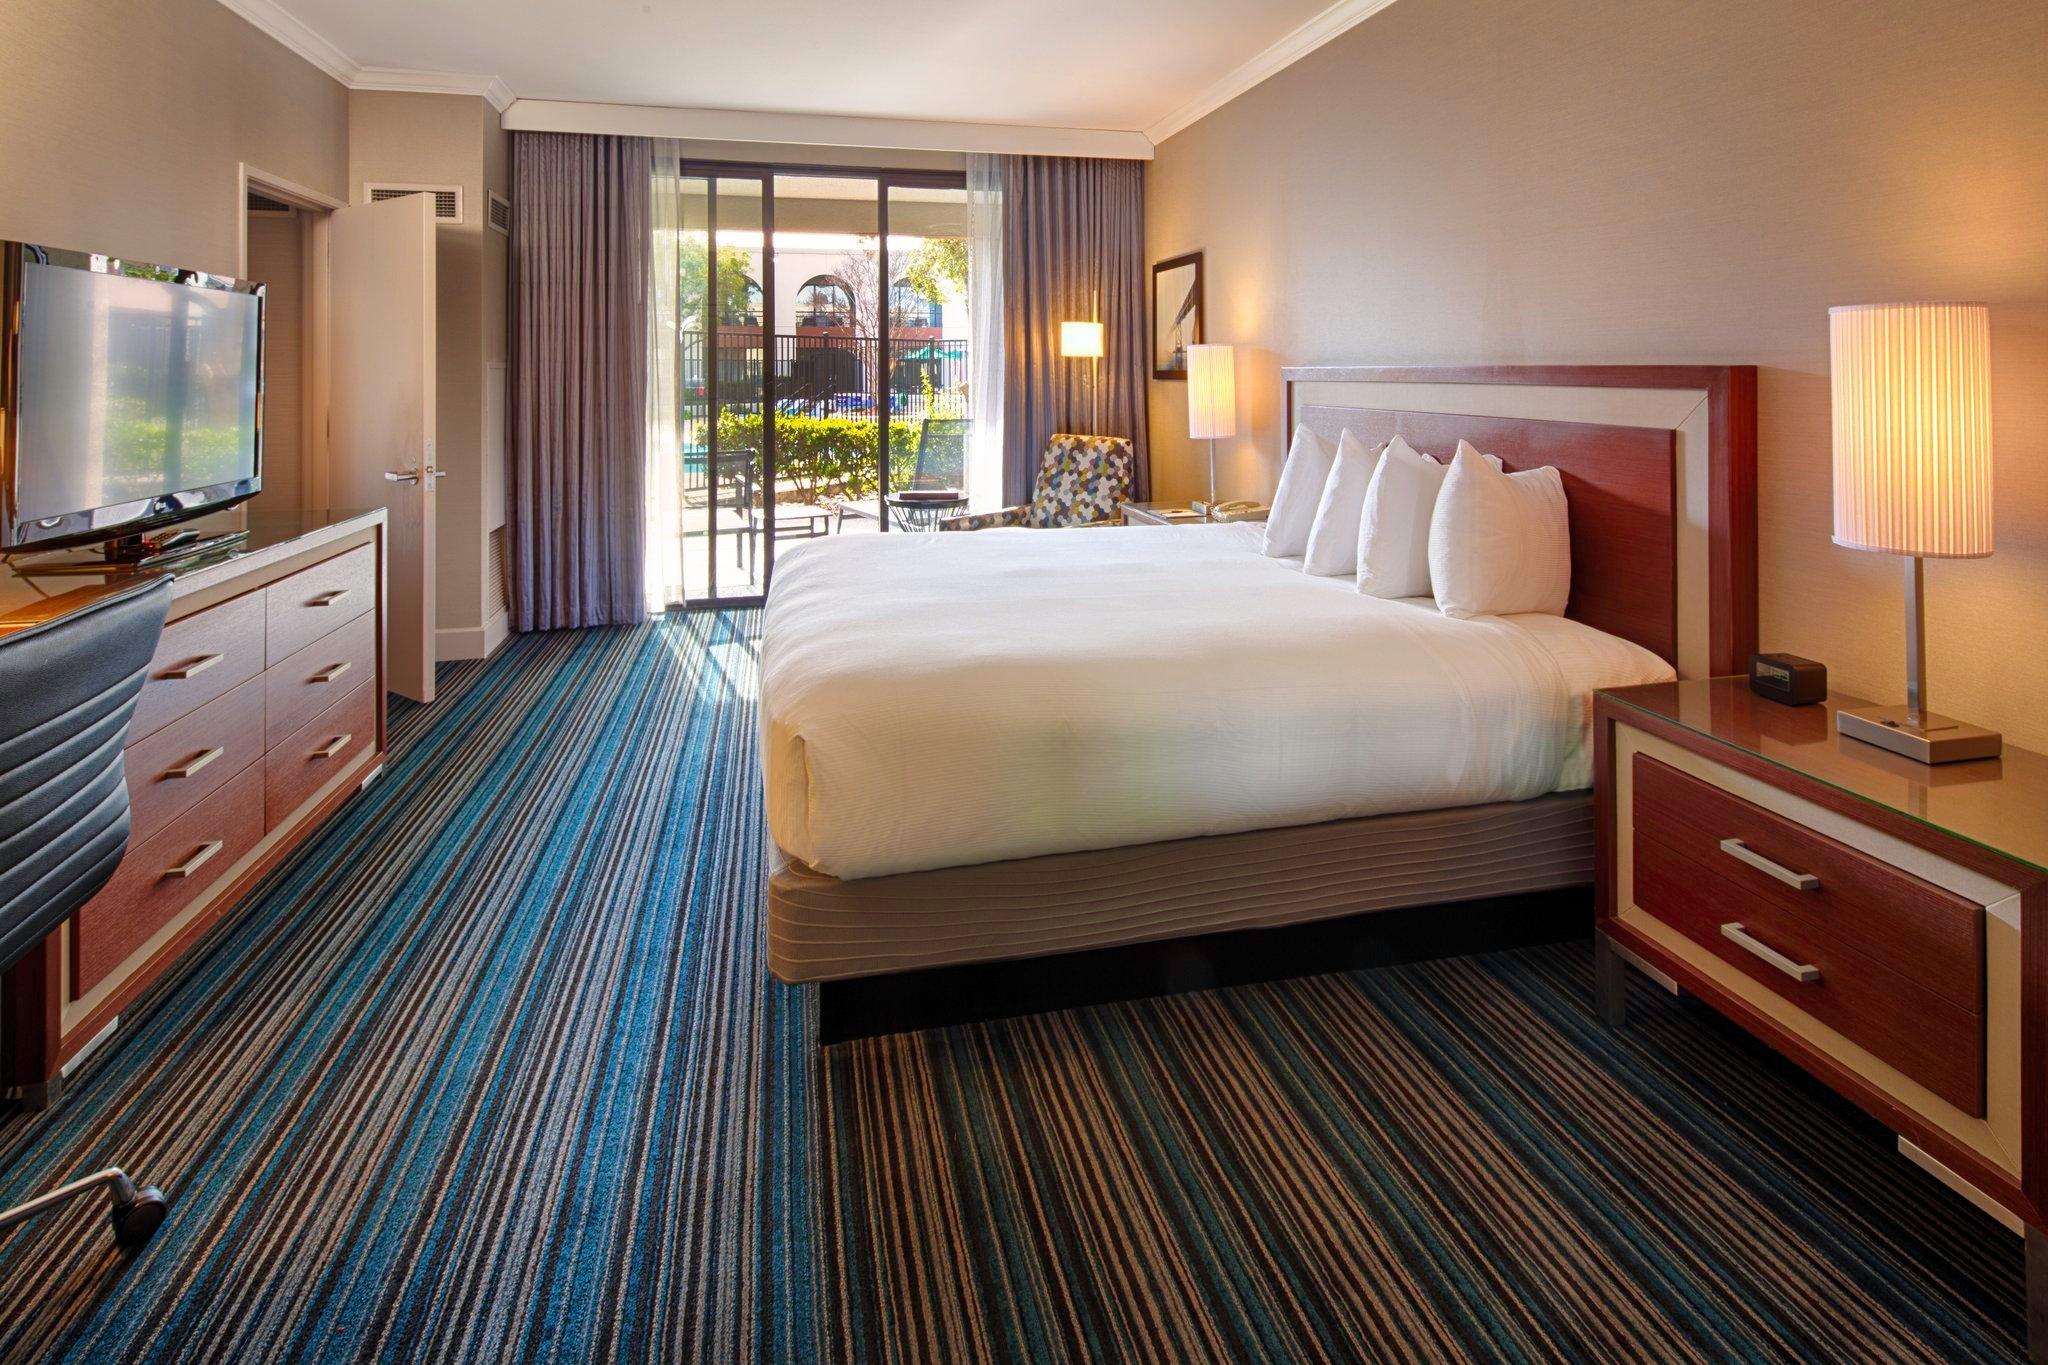 DoubleTree by Hilton Newark-Fremont